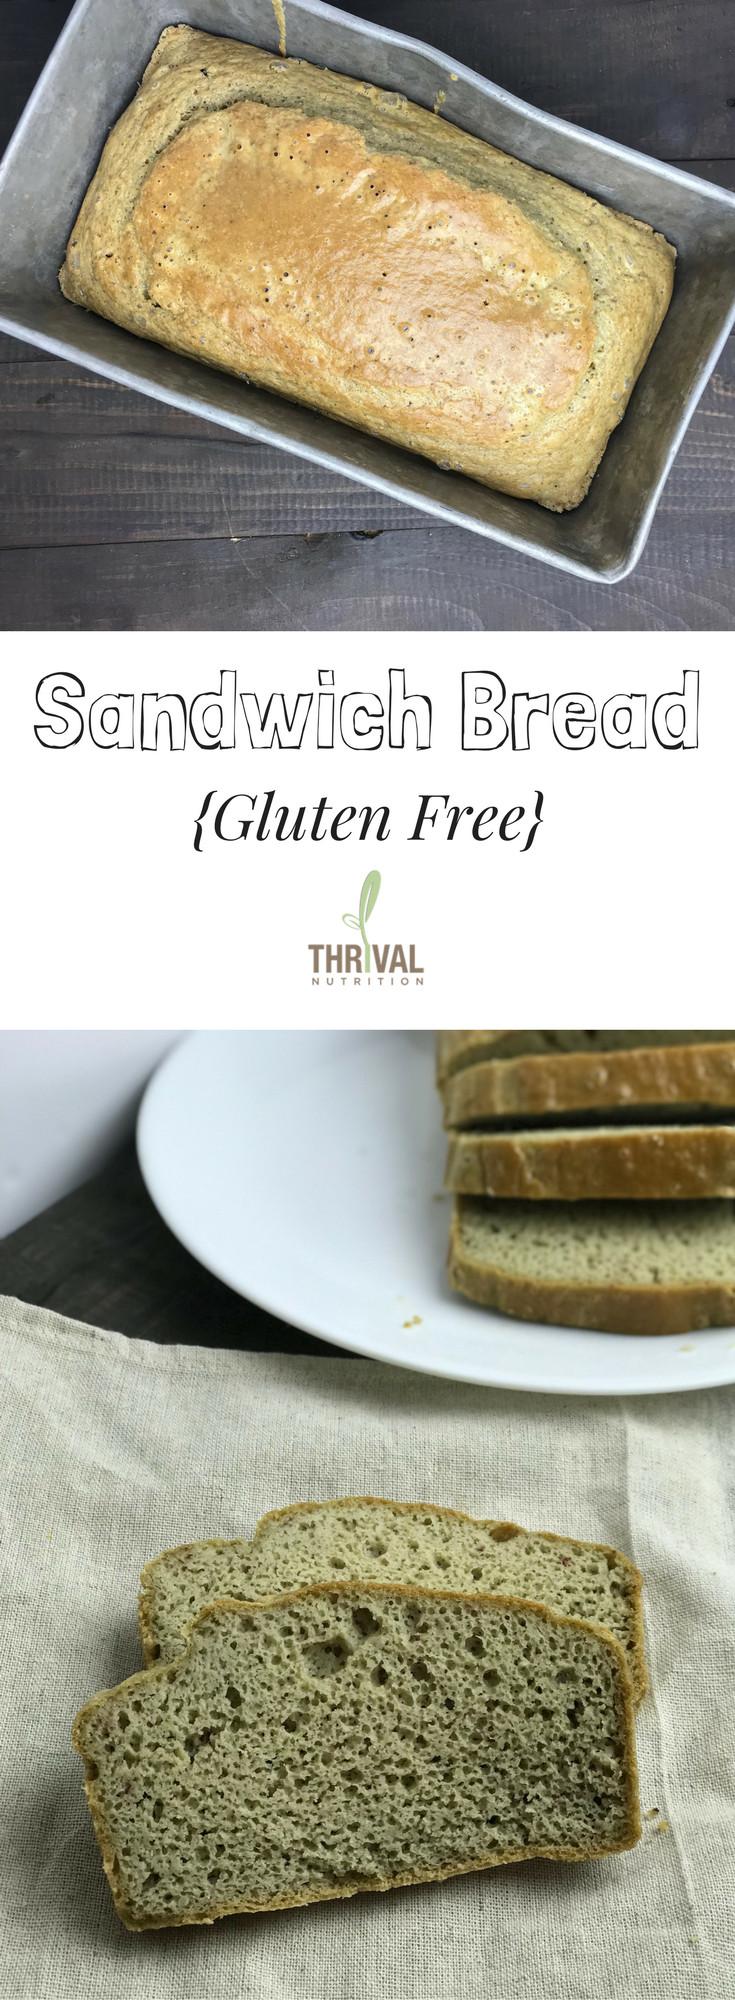 Udi'S Gluten Free Bread Calories  Gluten Free Sandwich Bread Thrival Nutrition